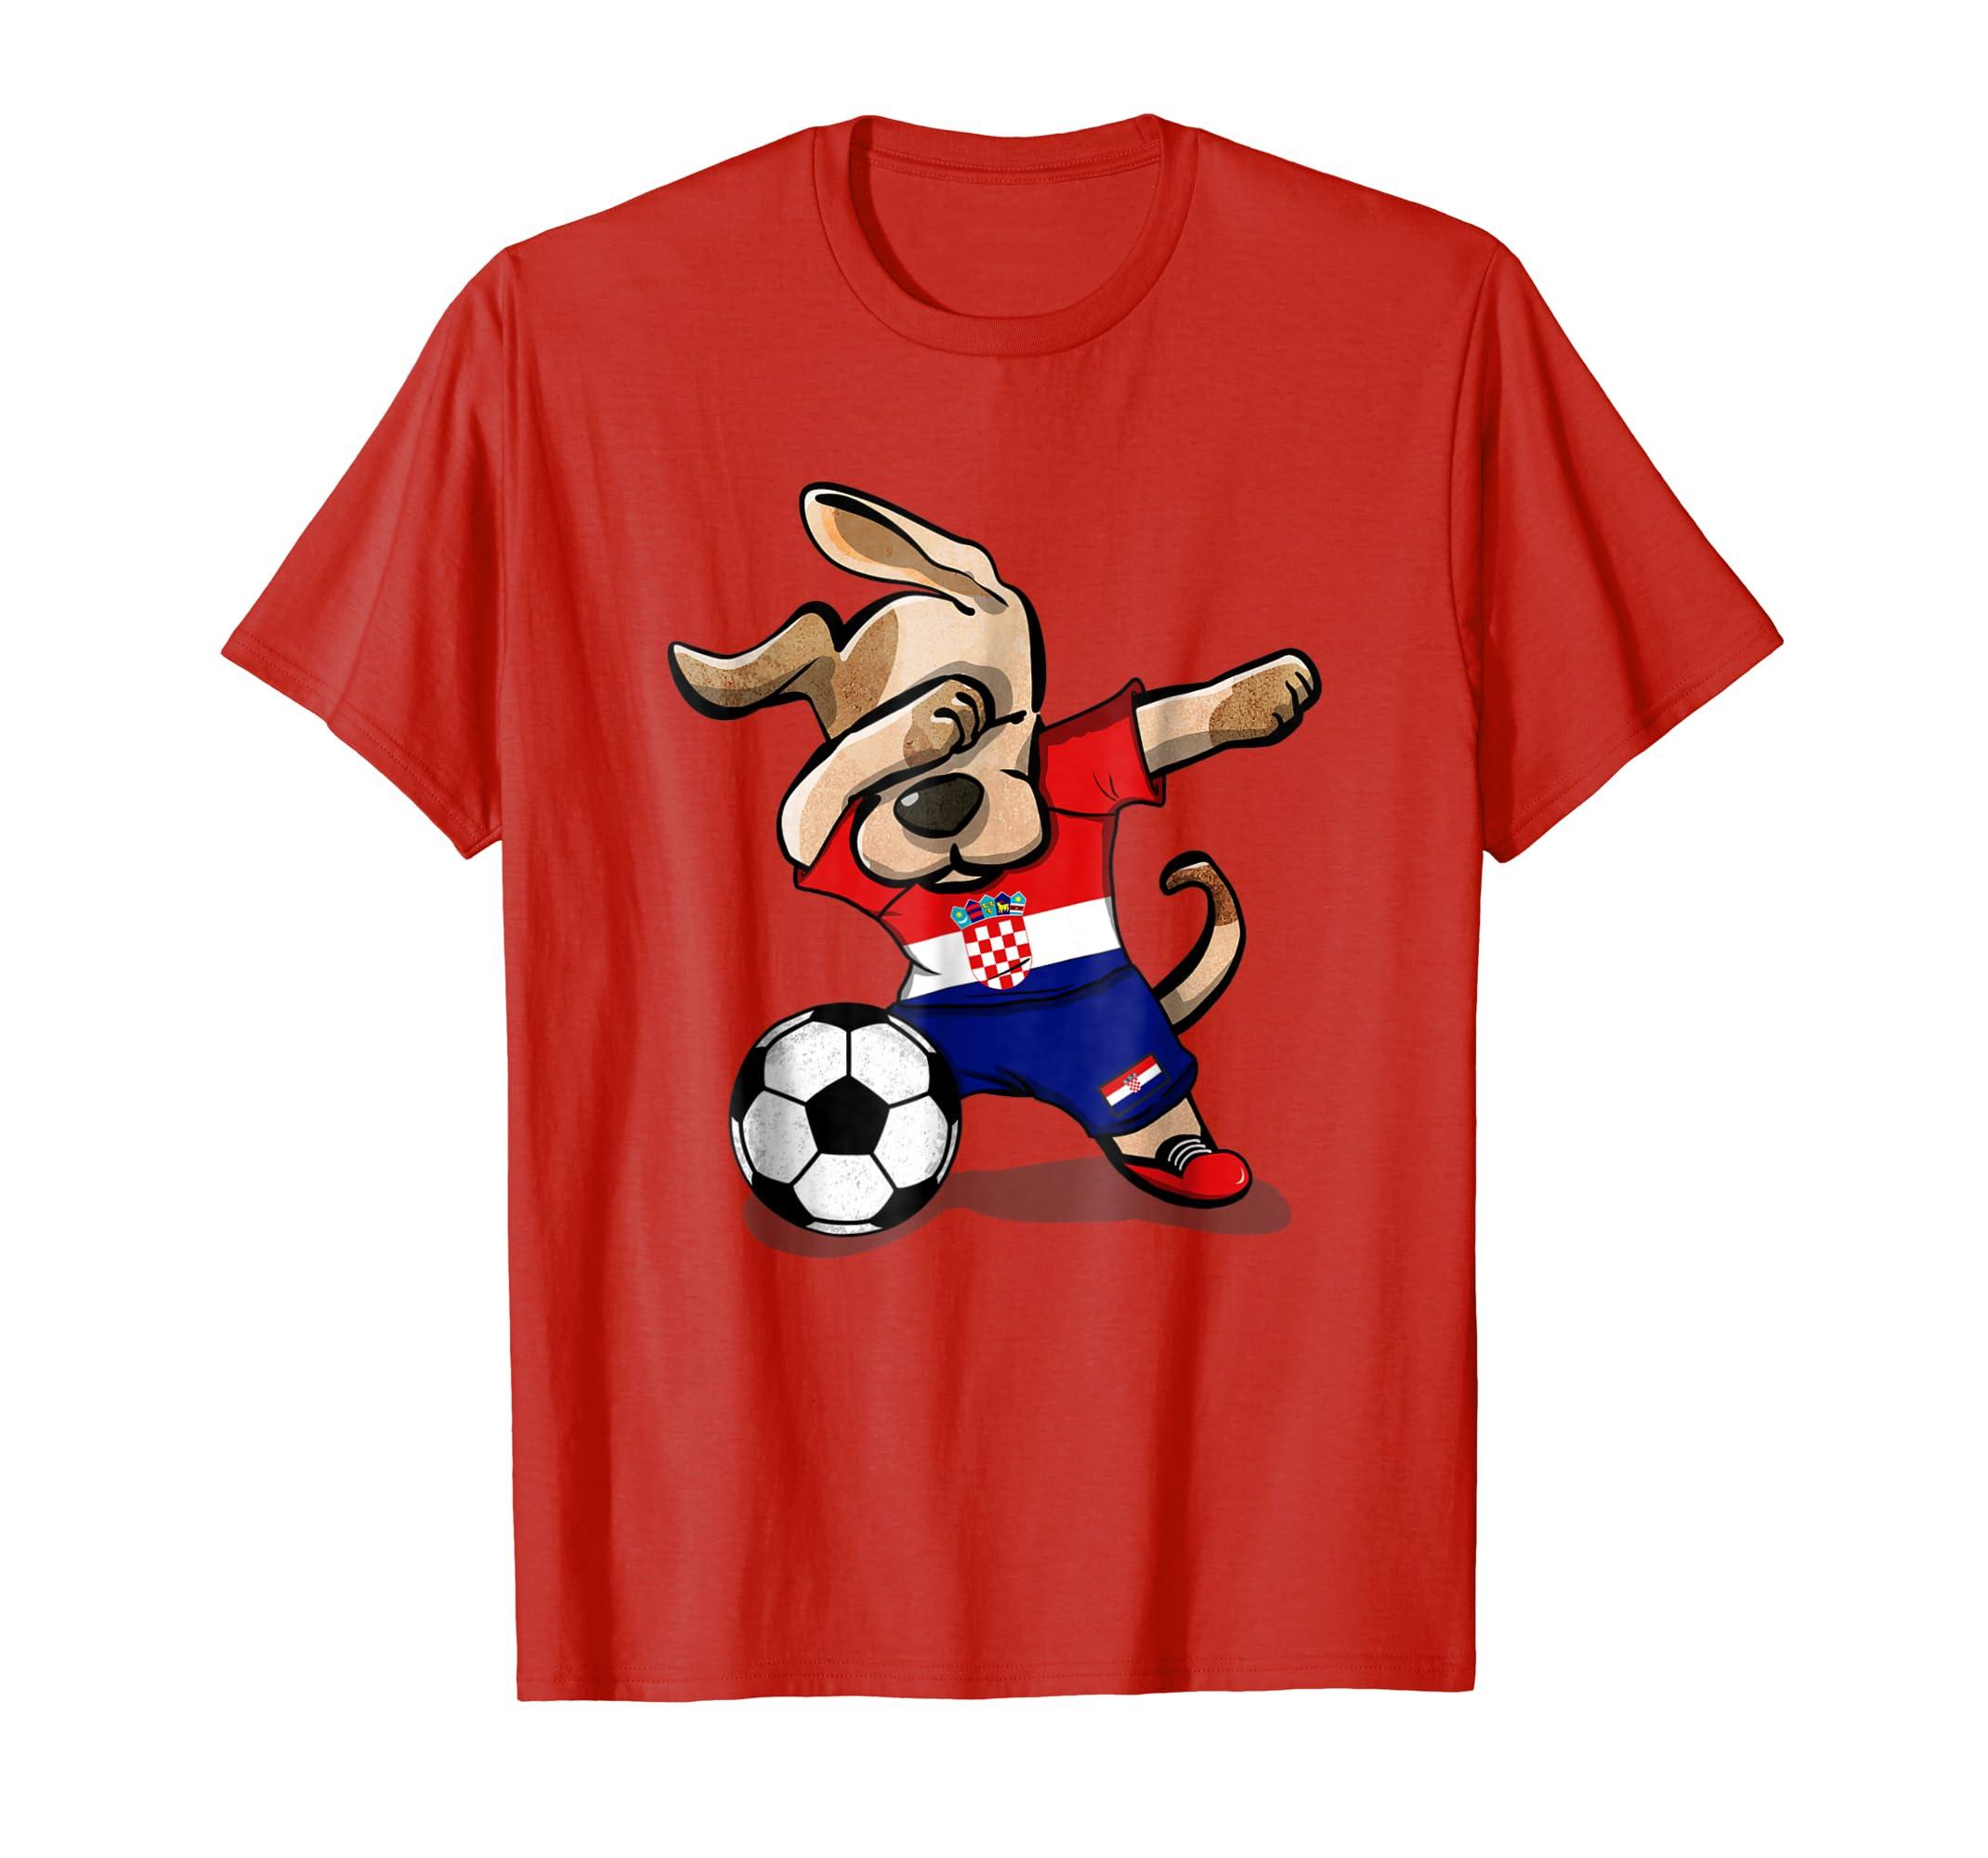 2a4278ff580 Amazon.com: Dog Dabbing Soccer Croatia Jersey Shirt Croatian Football:  Clothing